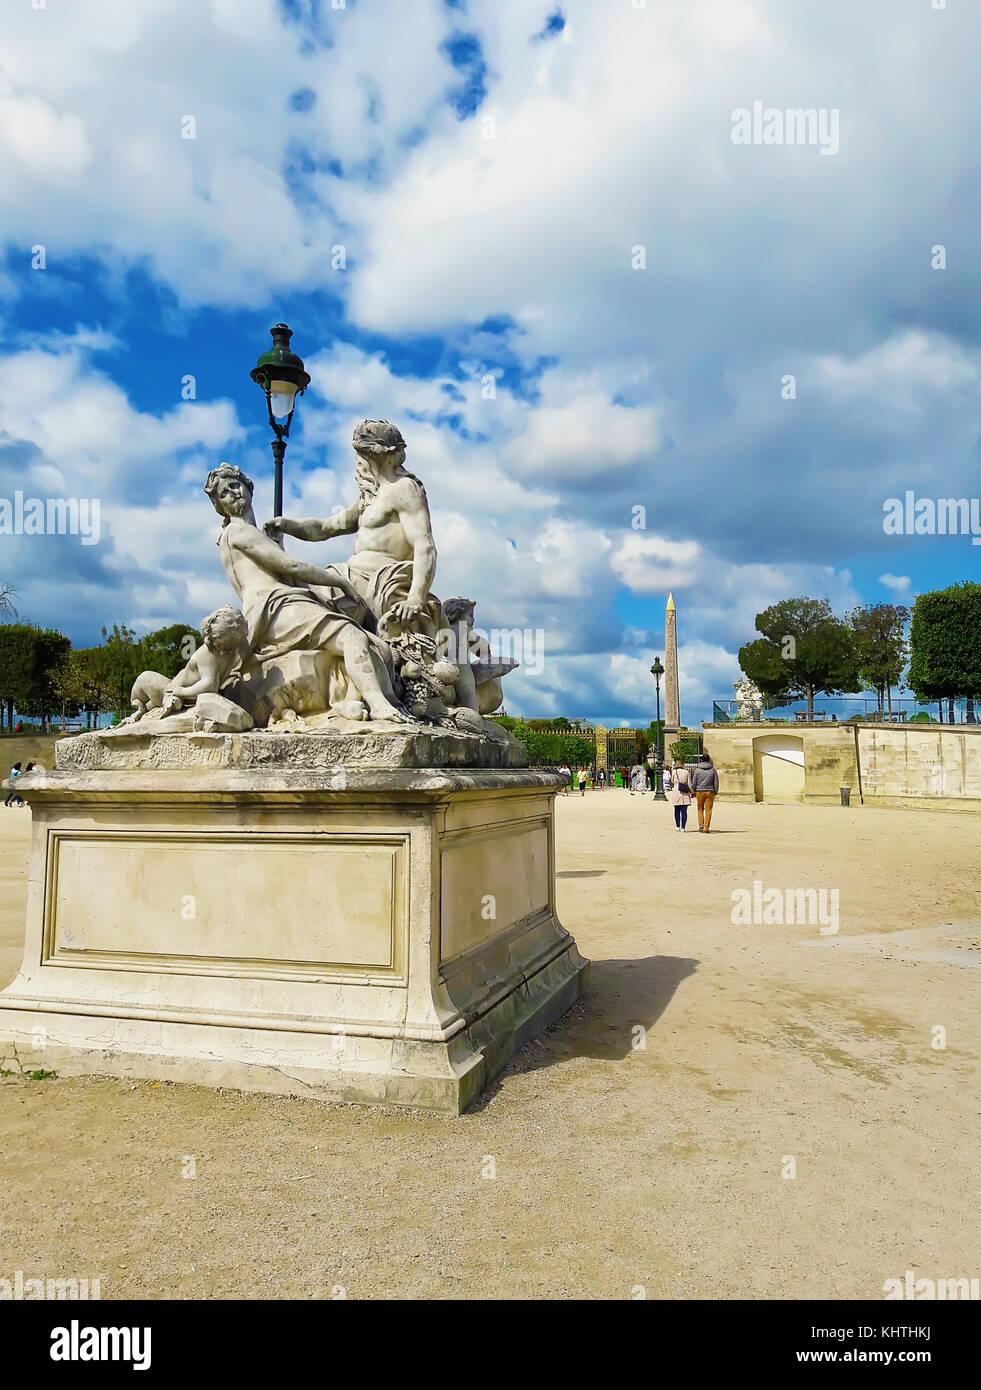 Female statue broken stock photos female statue broken stock images alamy - Statues jardin des tuileries ...